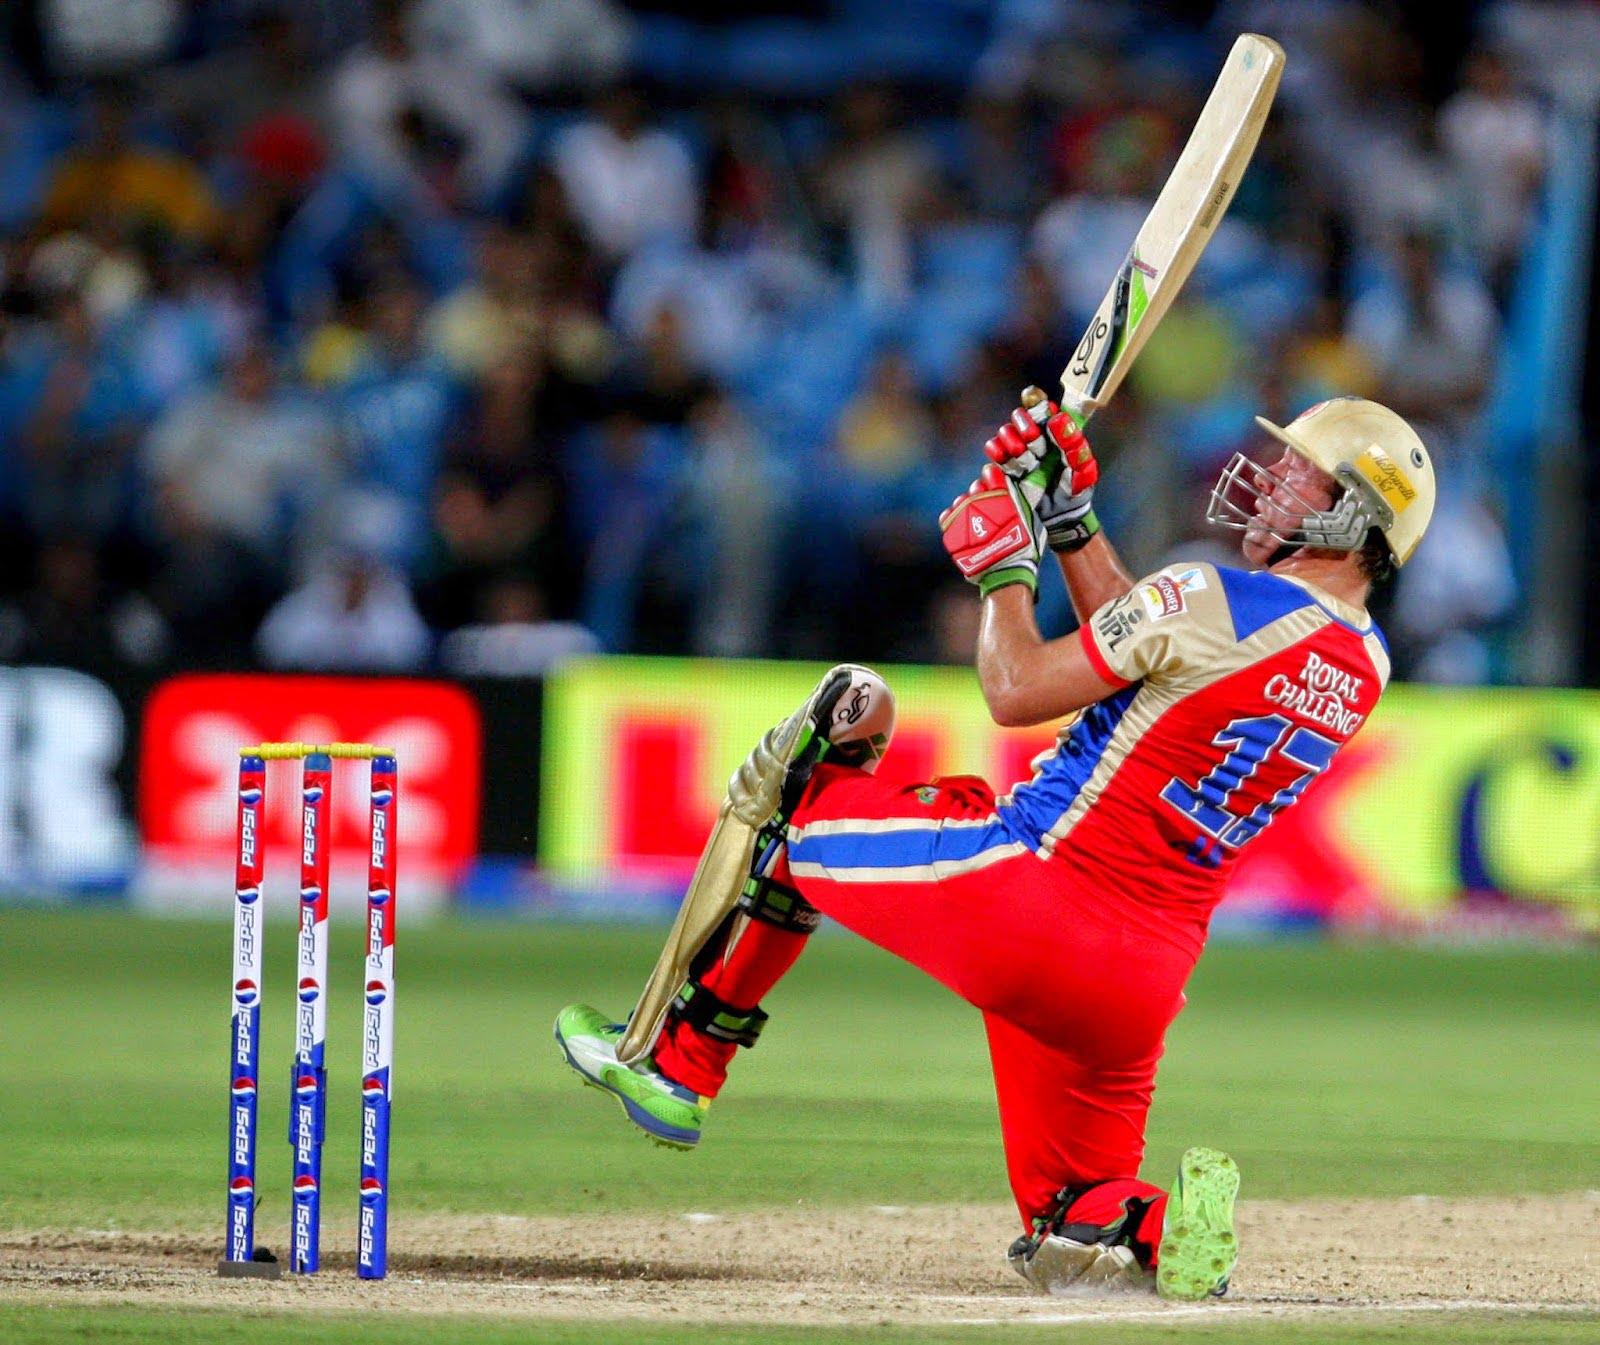 Reverse scoop – AB De Villiers